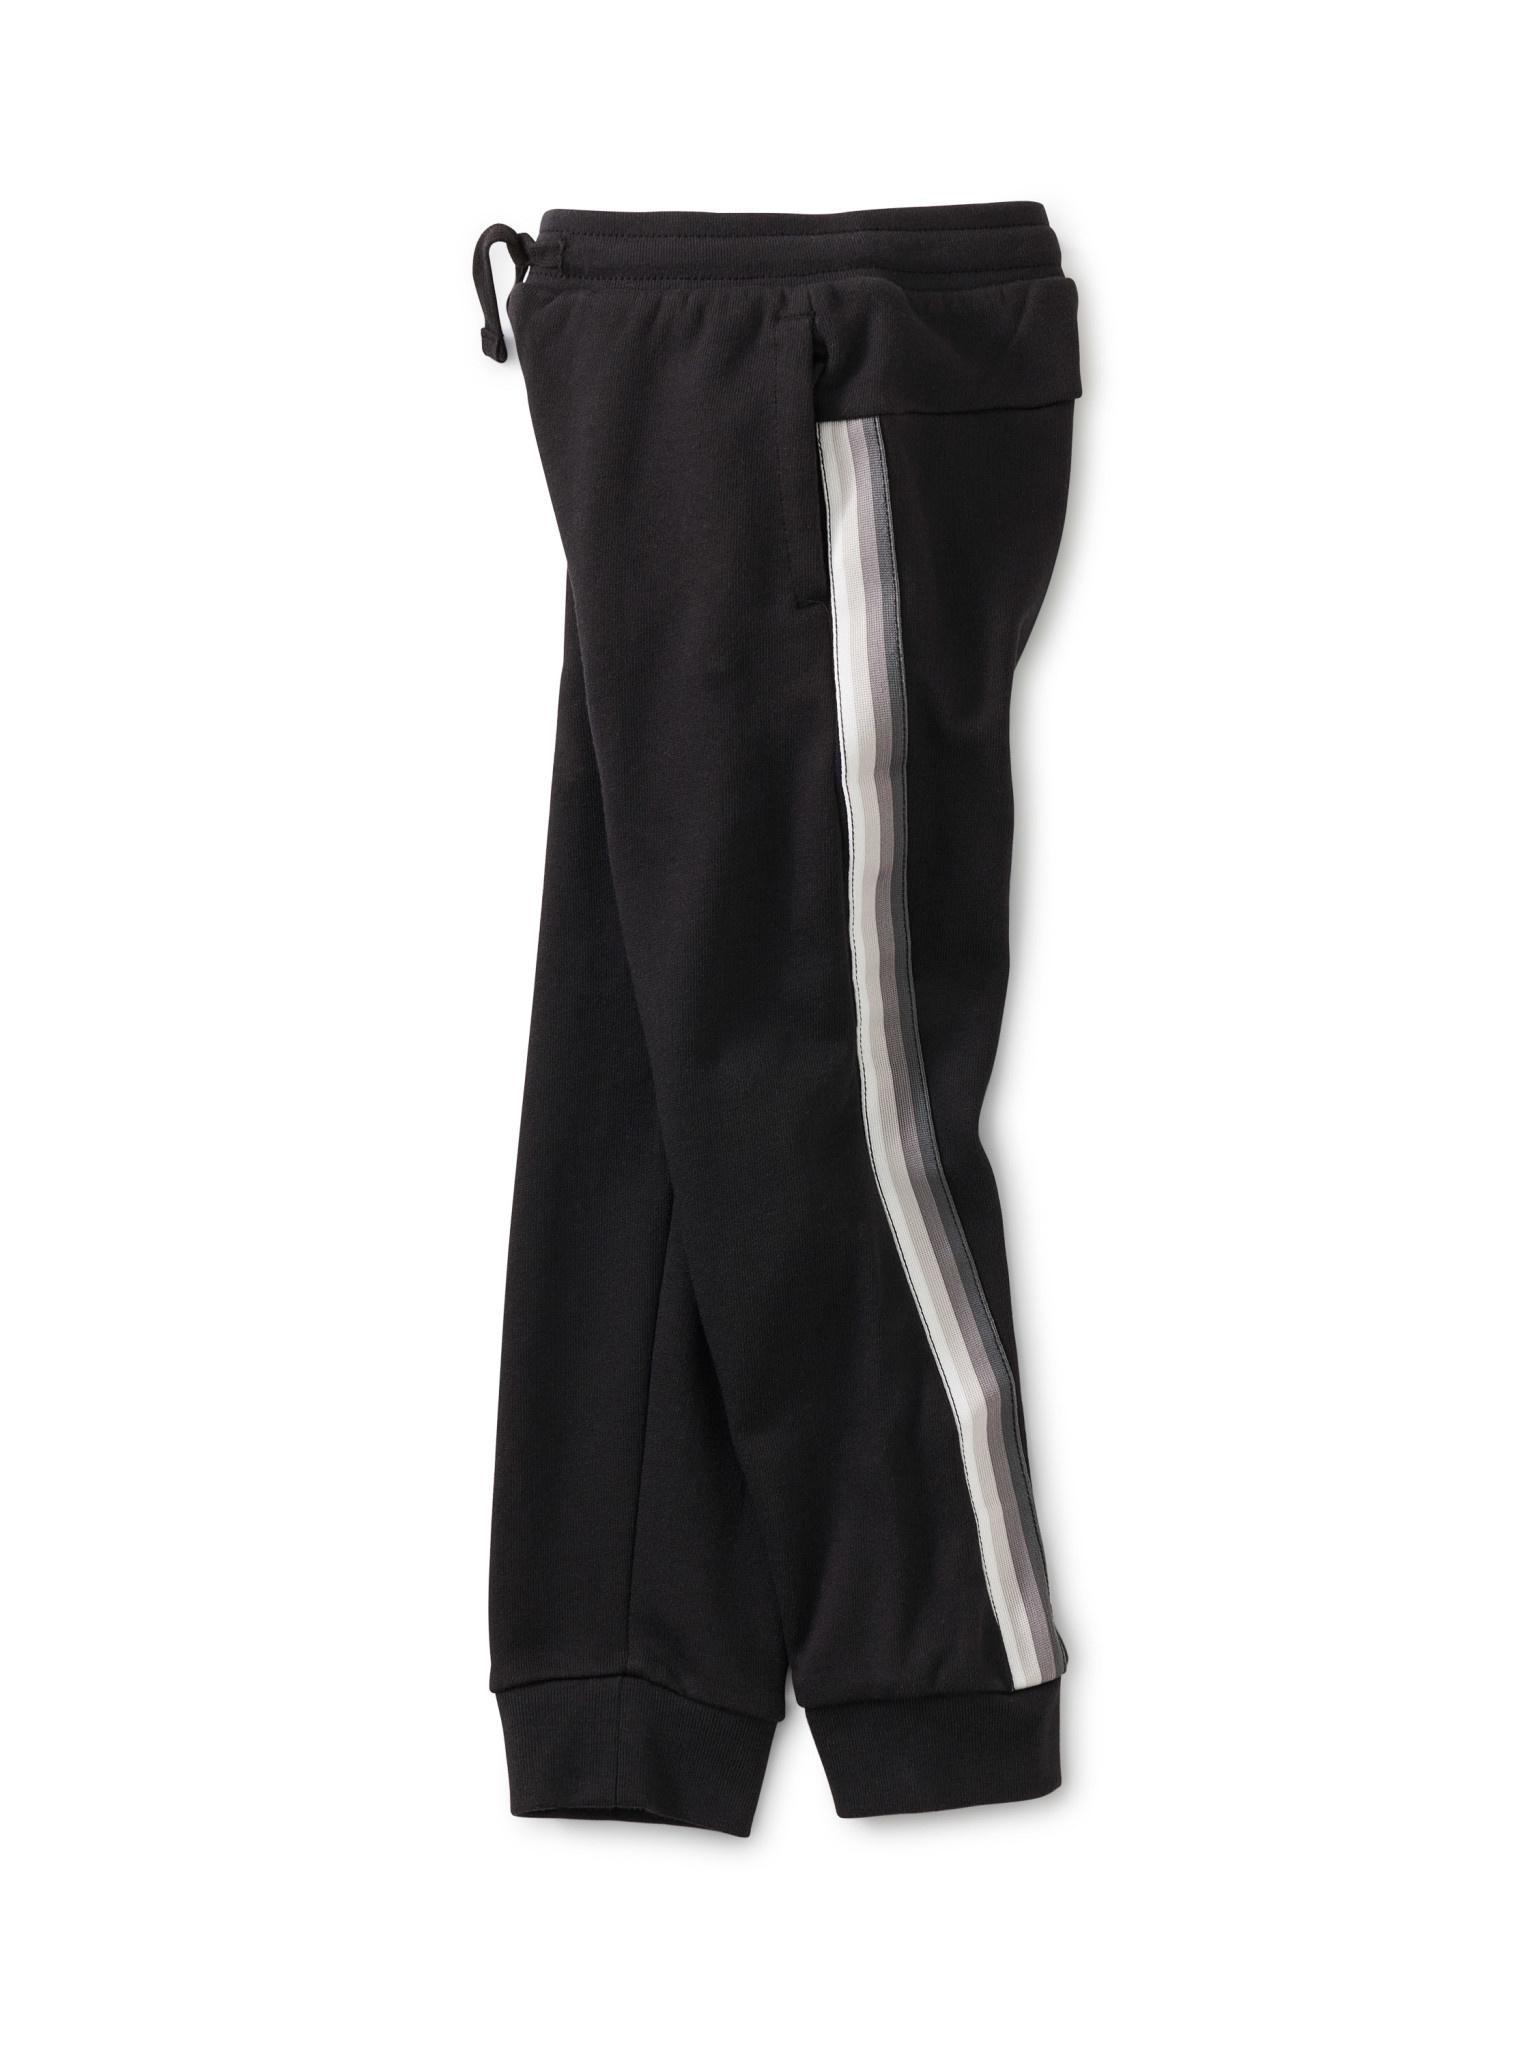 Tea Collection Stripe-Out Jogger - Jet Black